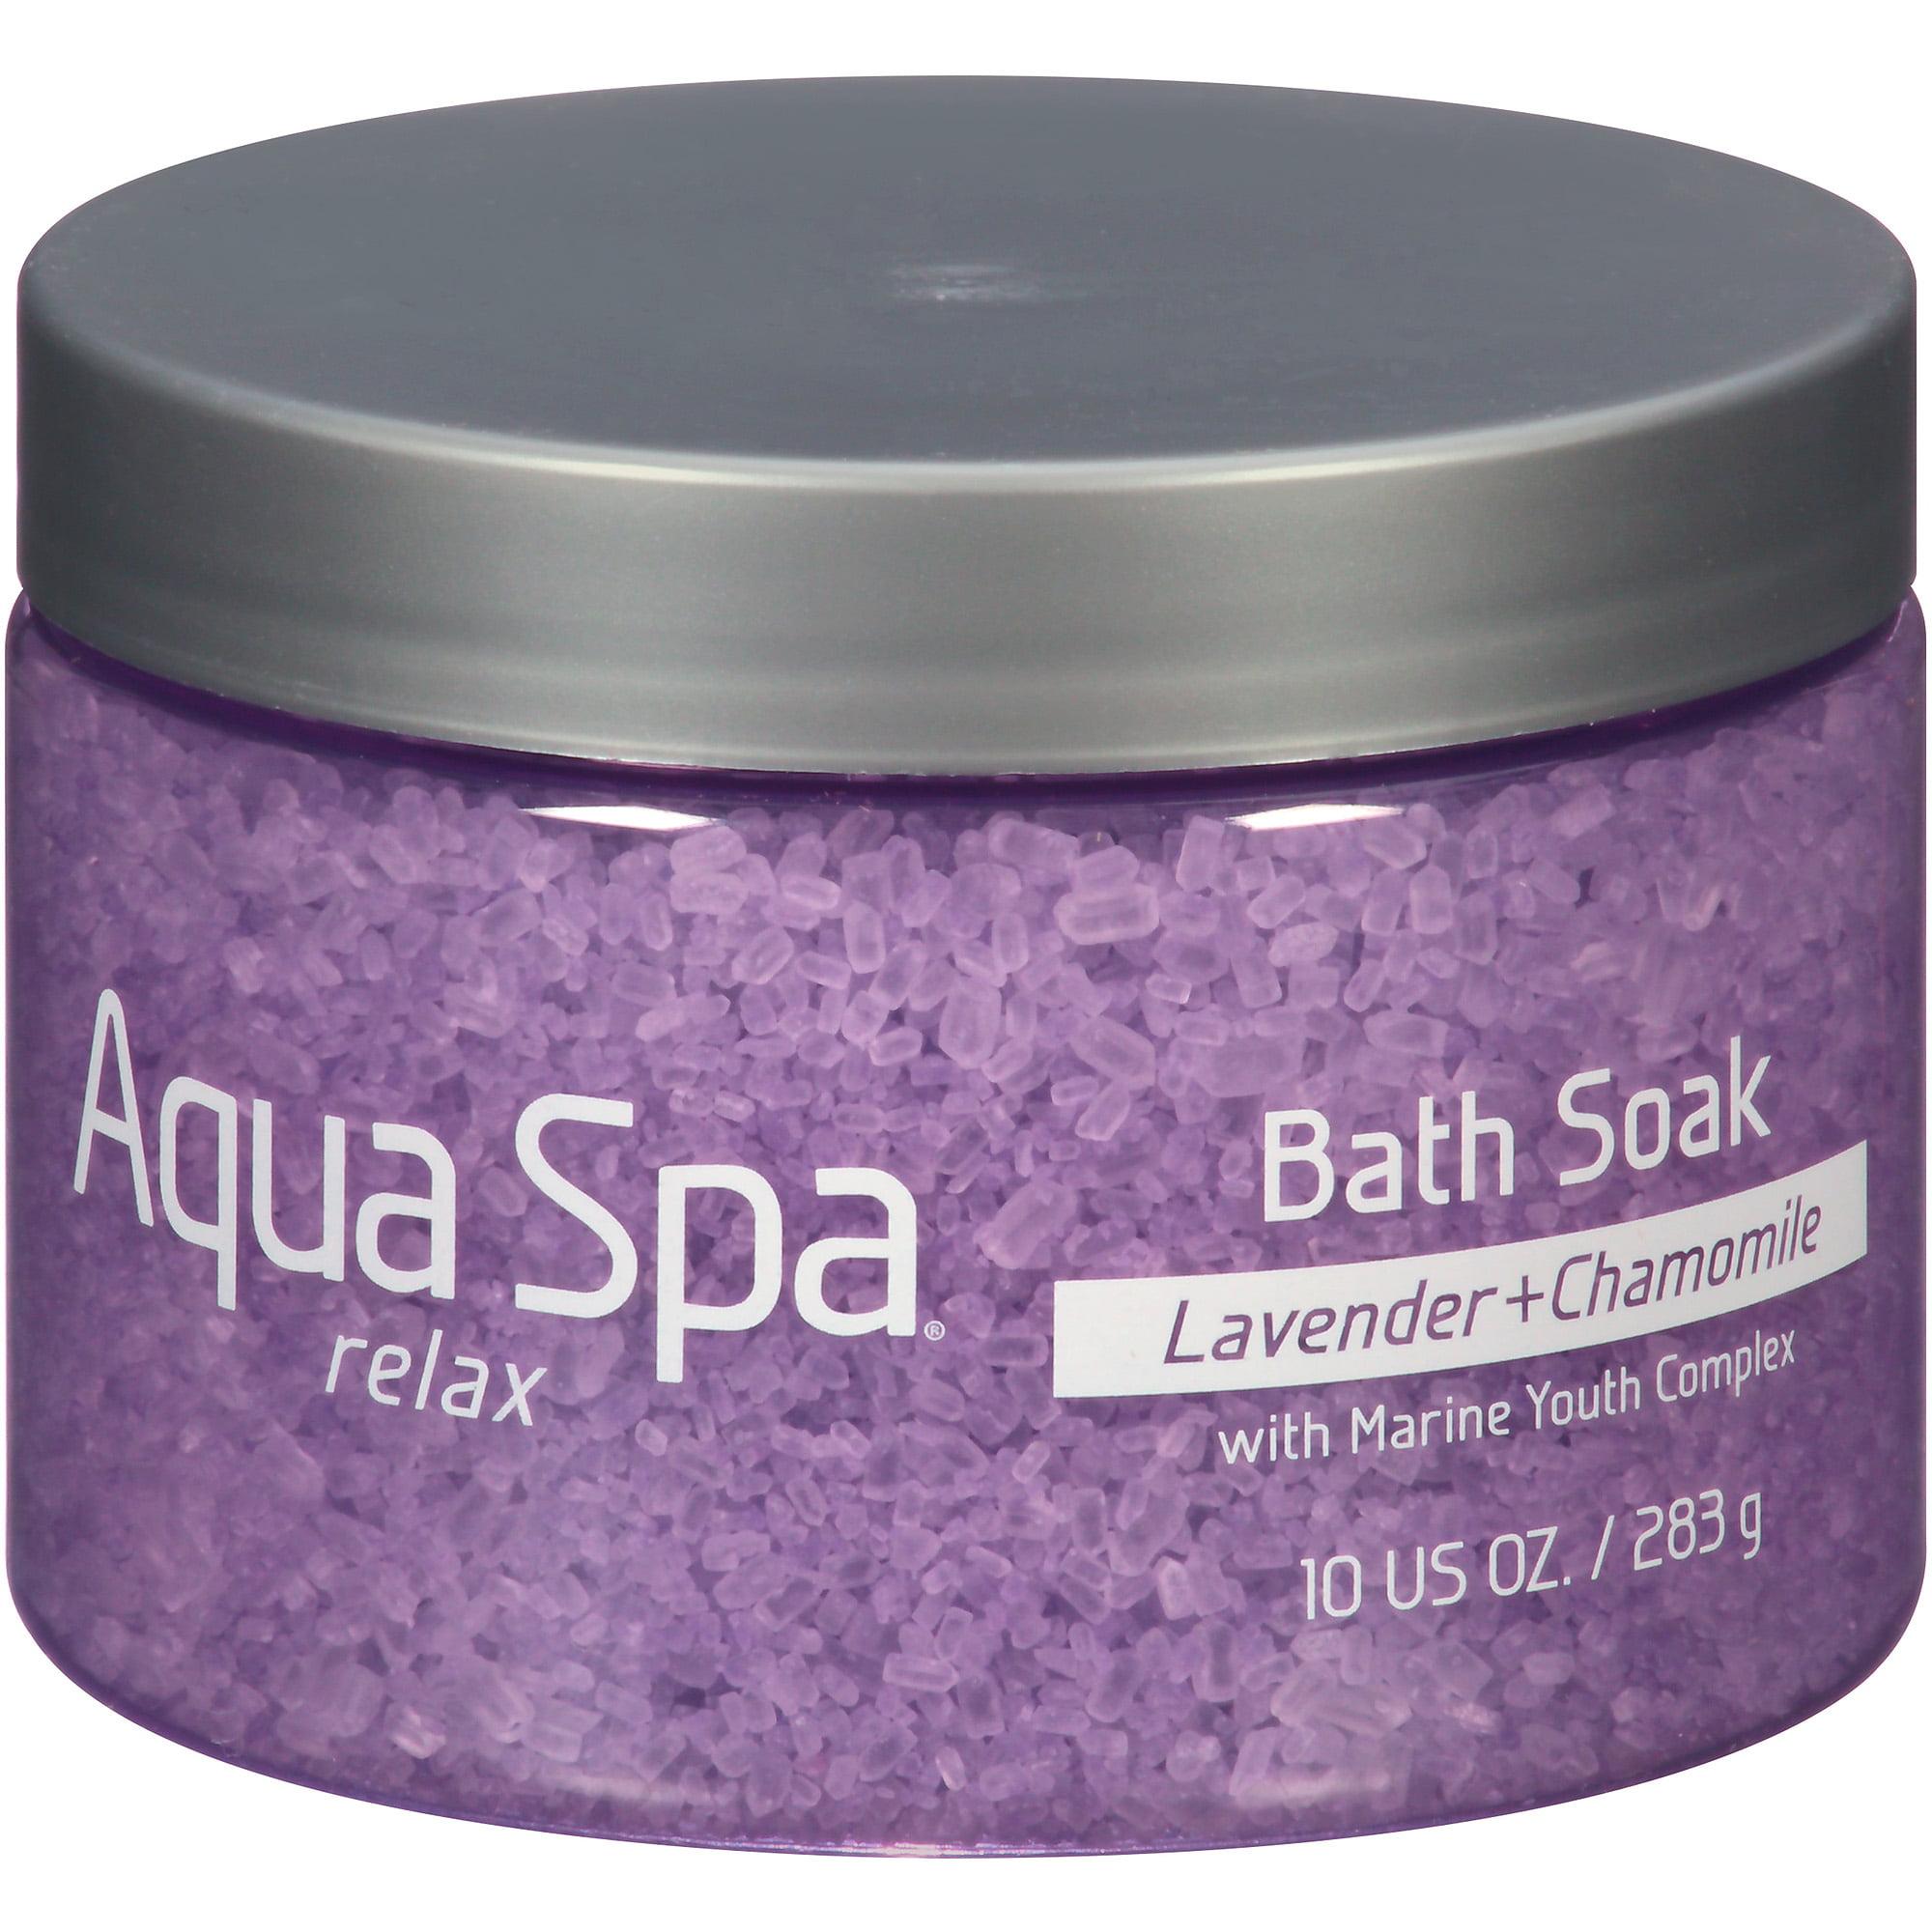 Aqua Spa Lavender + Chamomile Relax Bath Soak, 10 oz